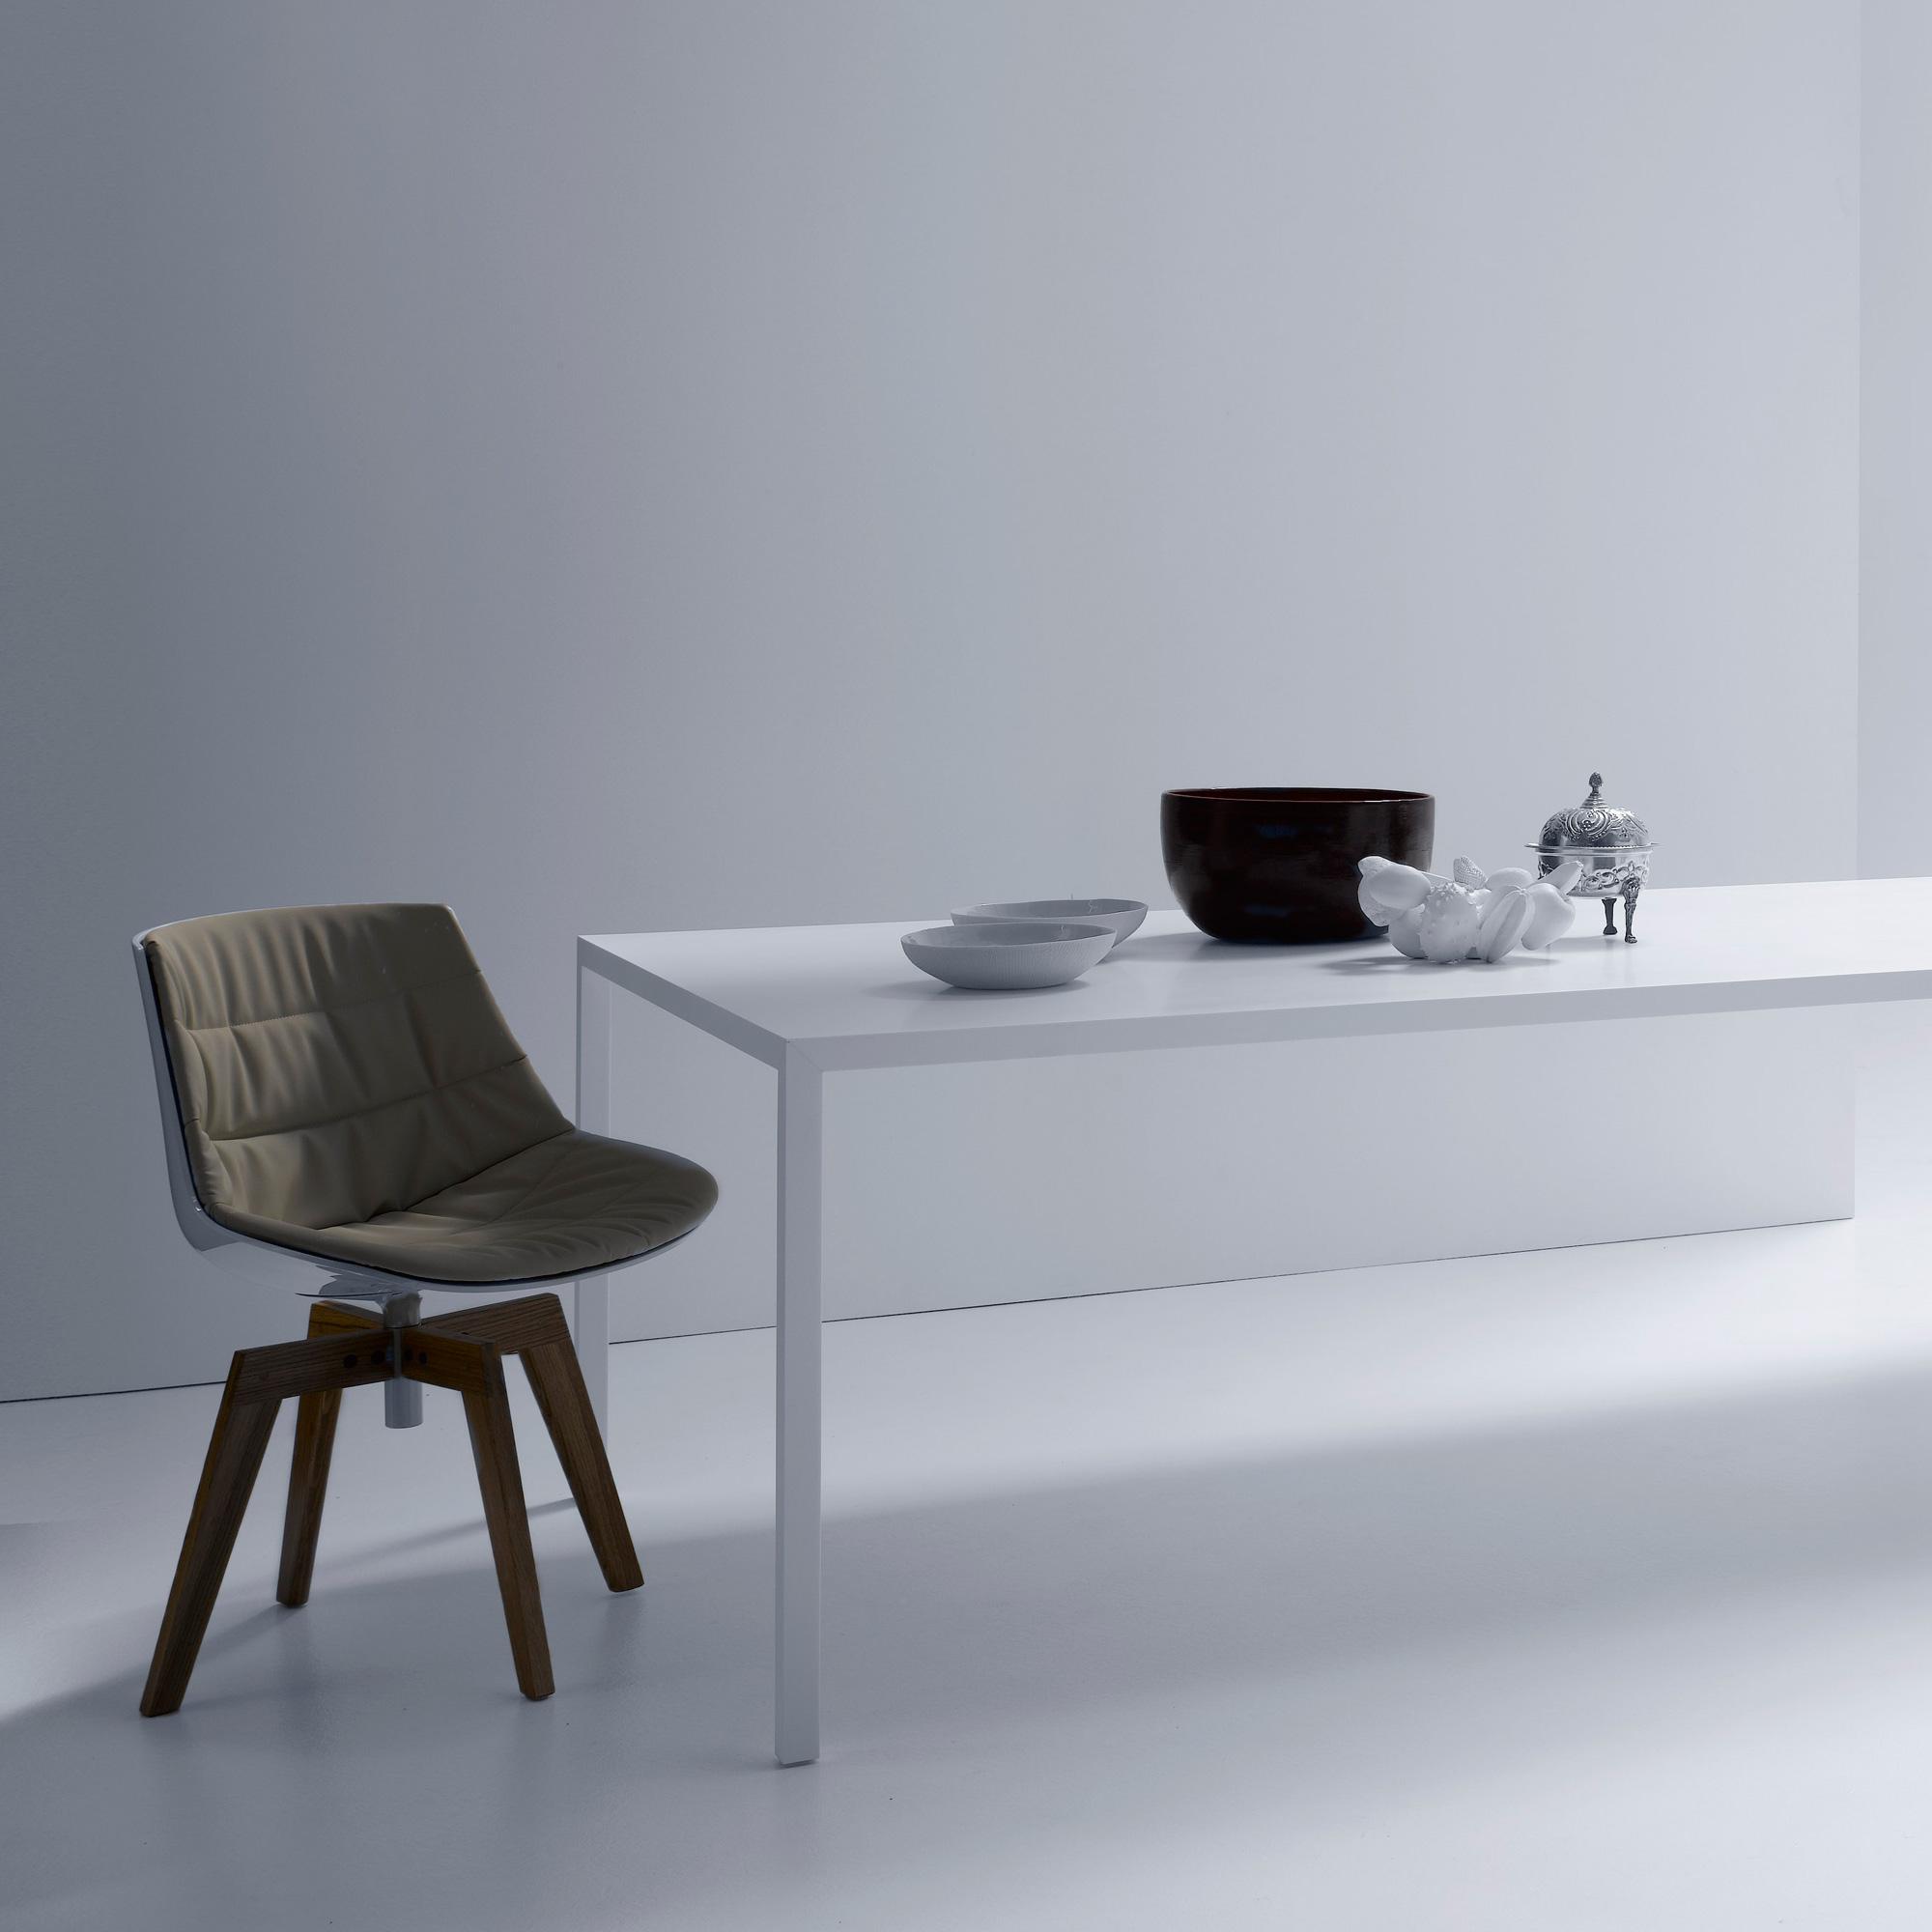 mdf italia tense tisch f042501p026d037s005 reuter onlineshop. Black Bedroom Furniture Sets. Home Design Ideas